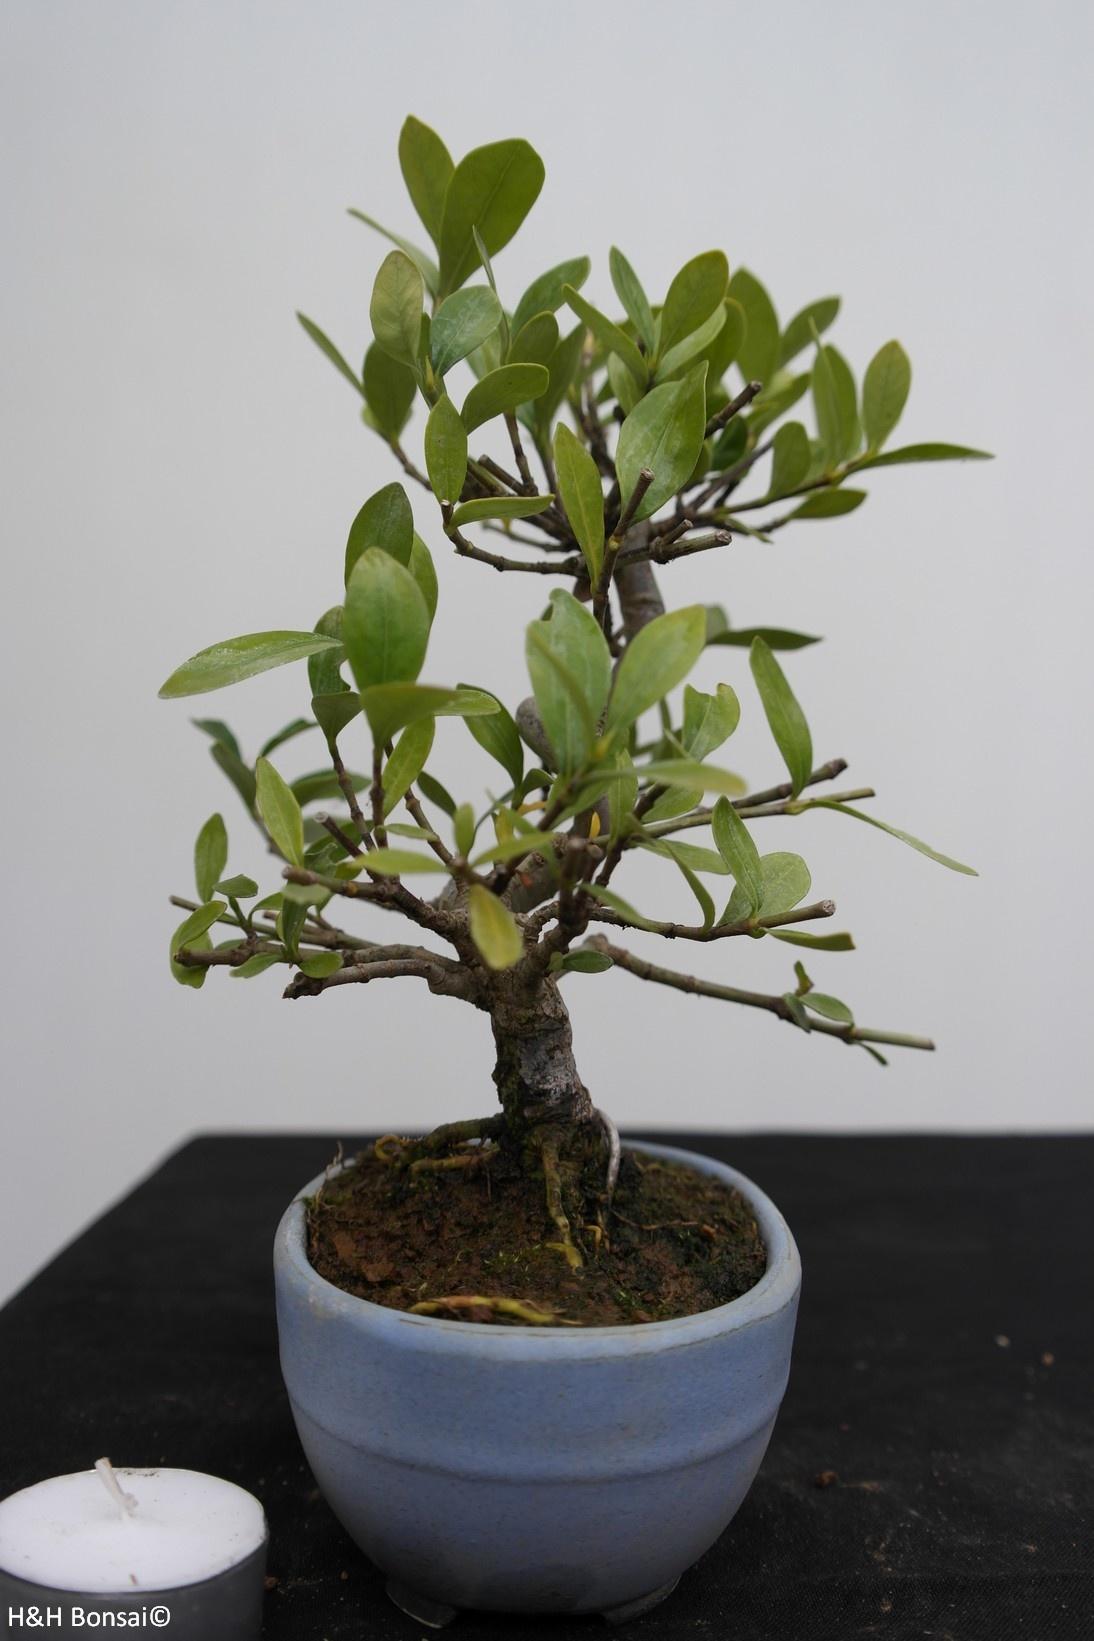 Bonsai Shohin Gardenia jasminoides, Kaapse jasmijn, nr. 7774